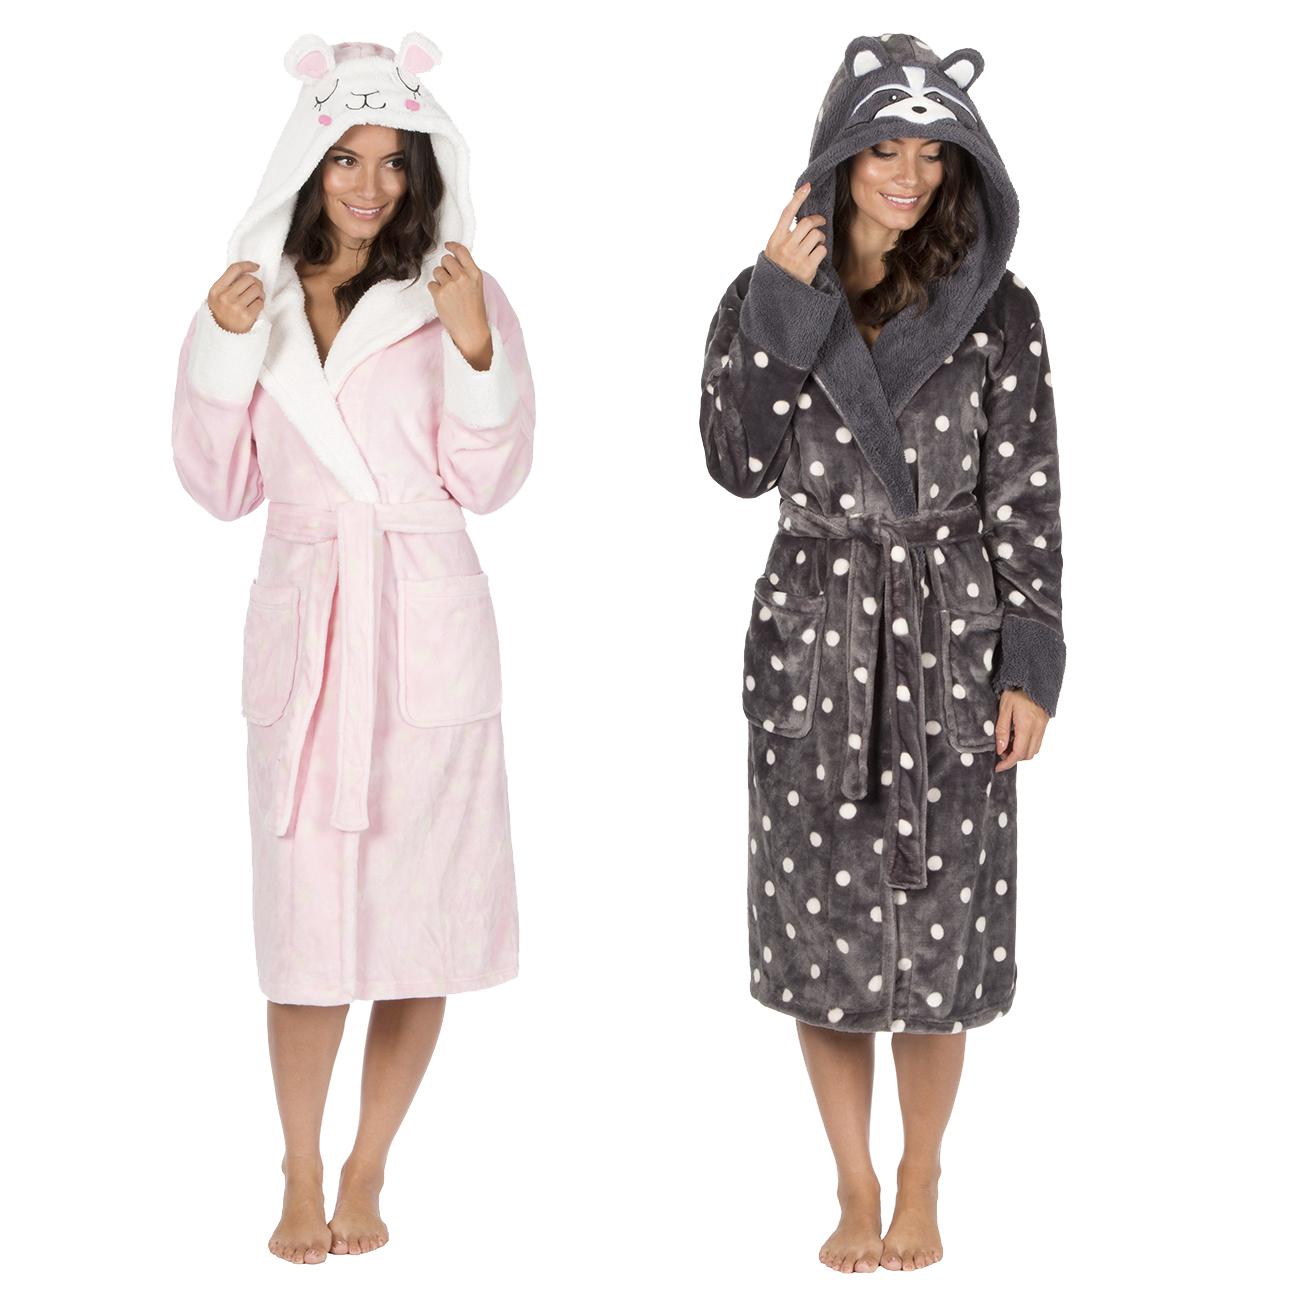 98388fb2fe Ladies Women s Novelty Dressing Gown Animal Fleece Robe Polka Dot Hooded  Sheep